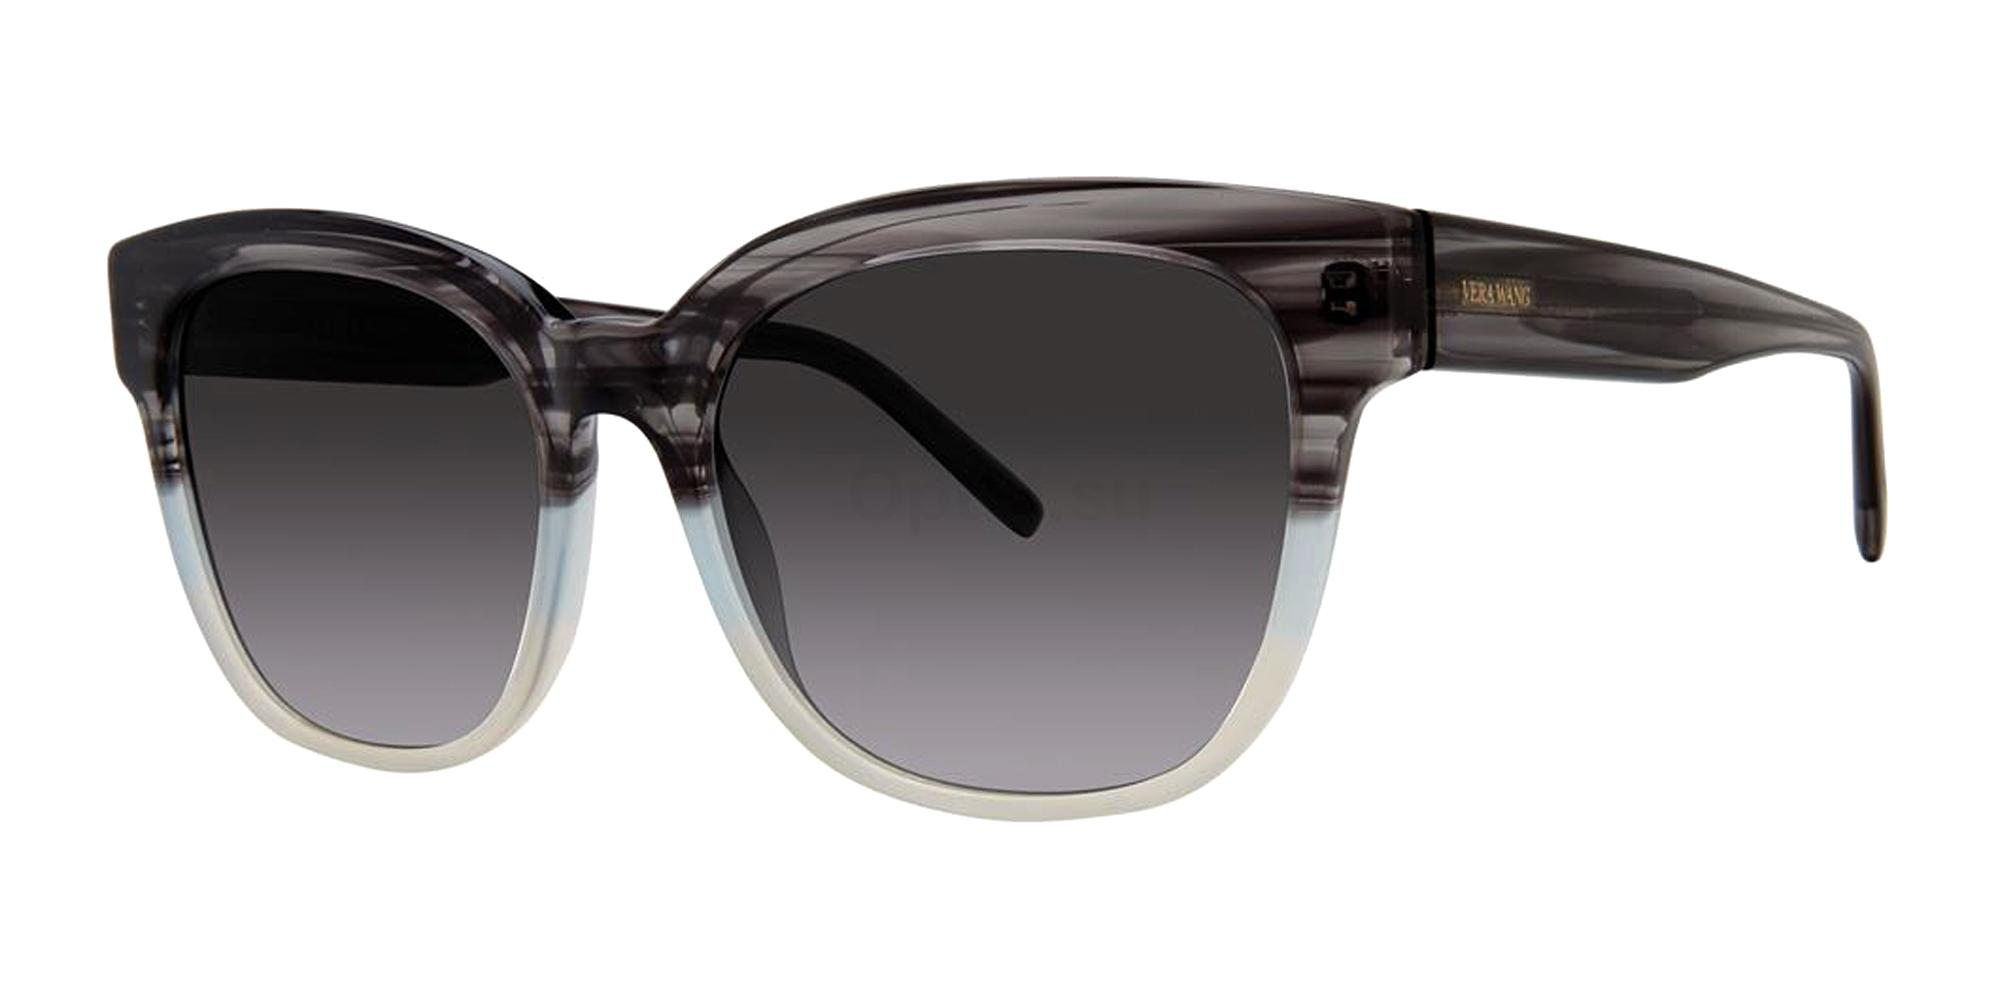 Gray Fade V481 Sunglasses, Vera Wang